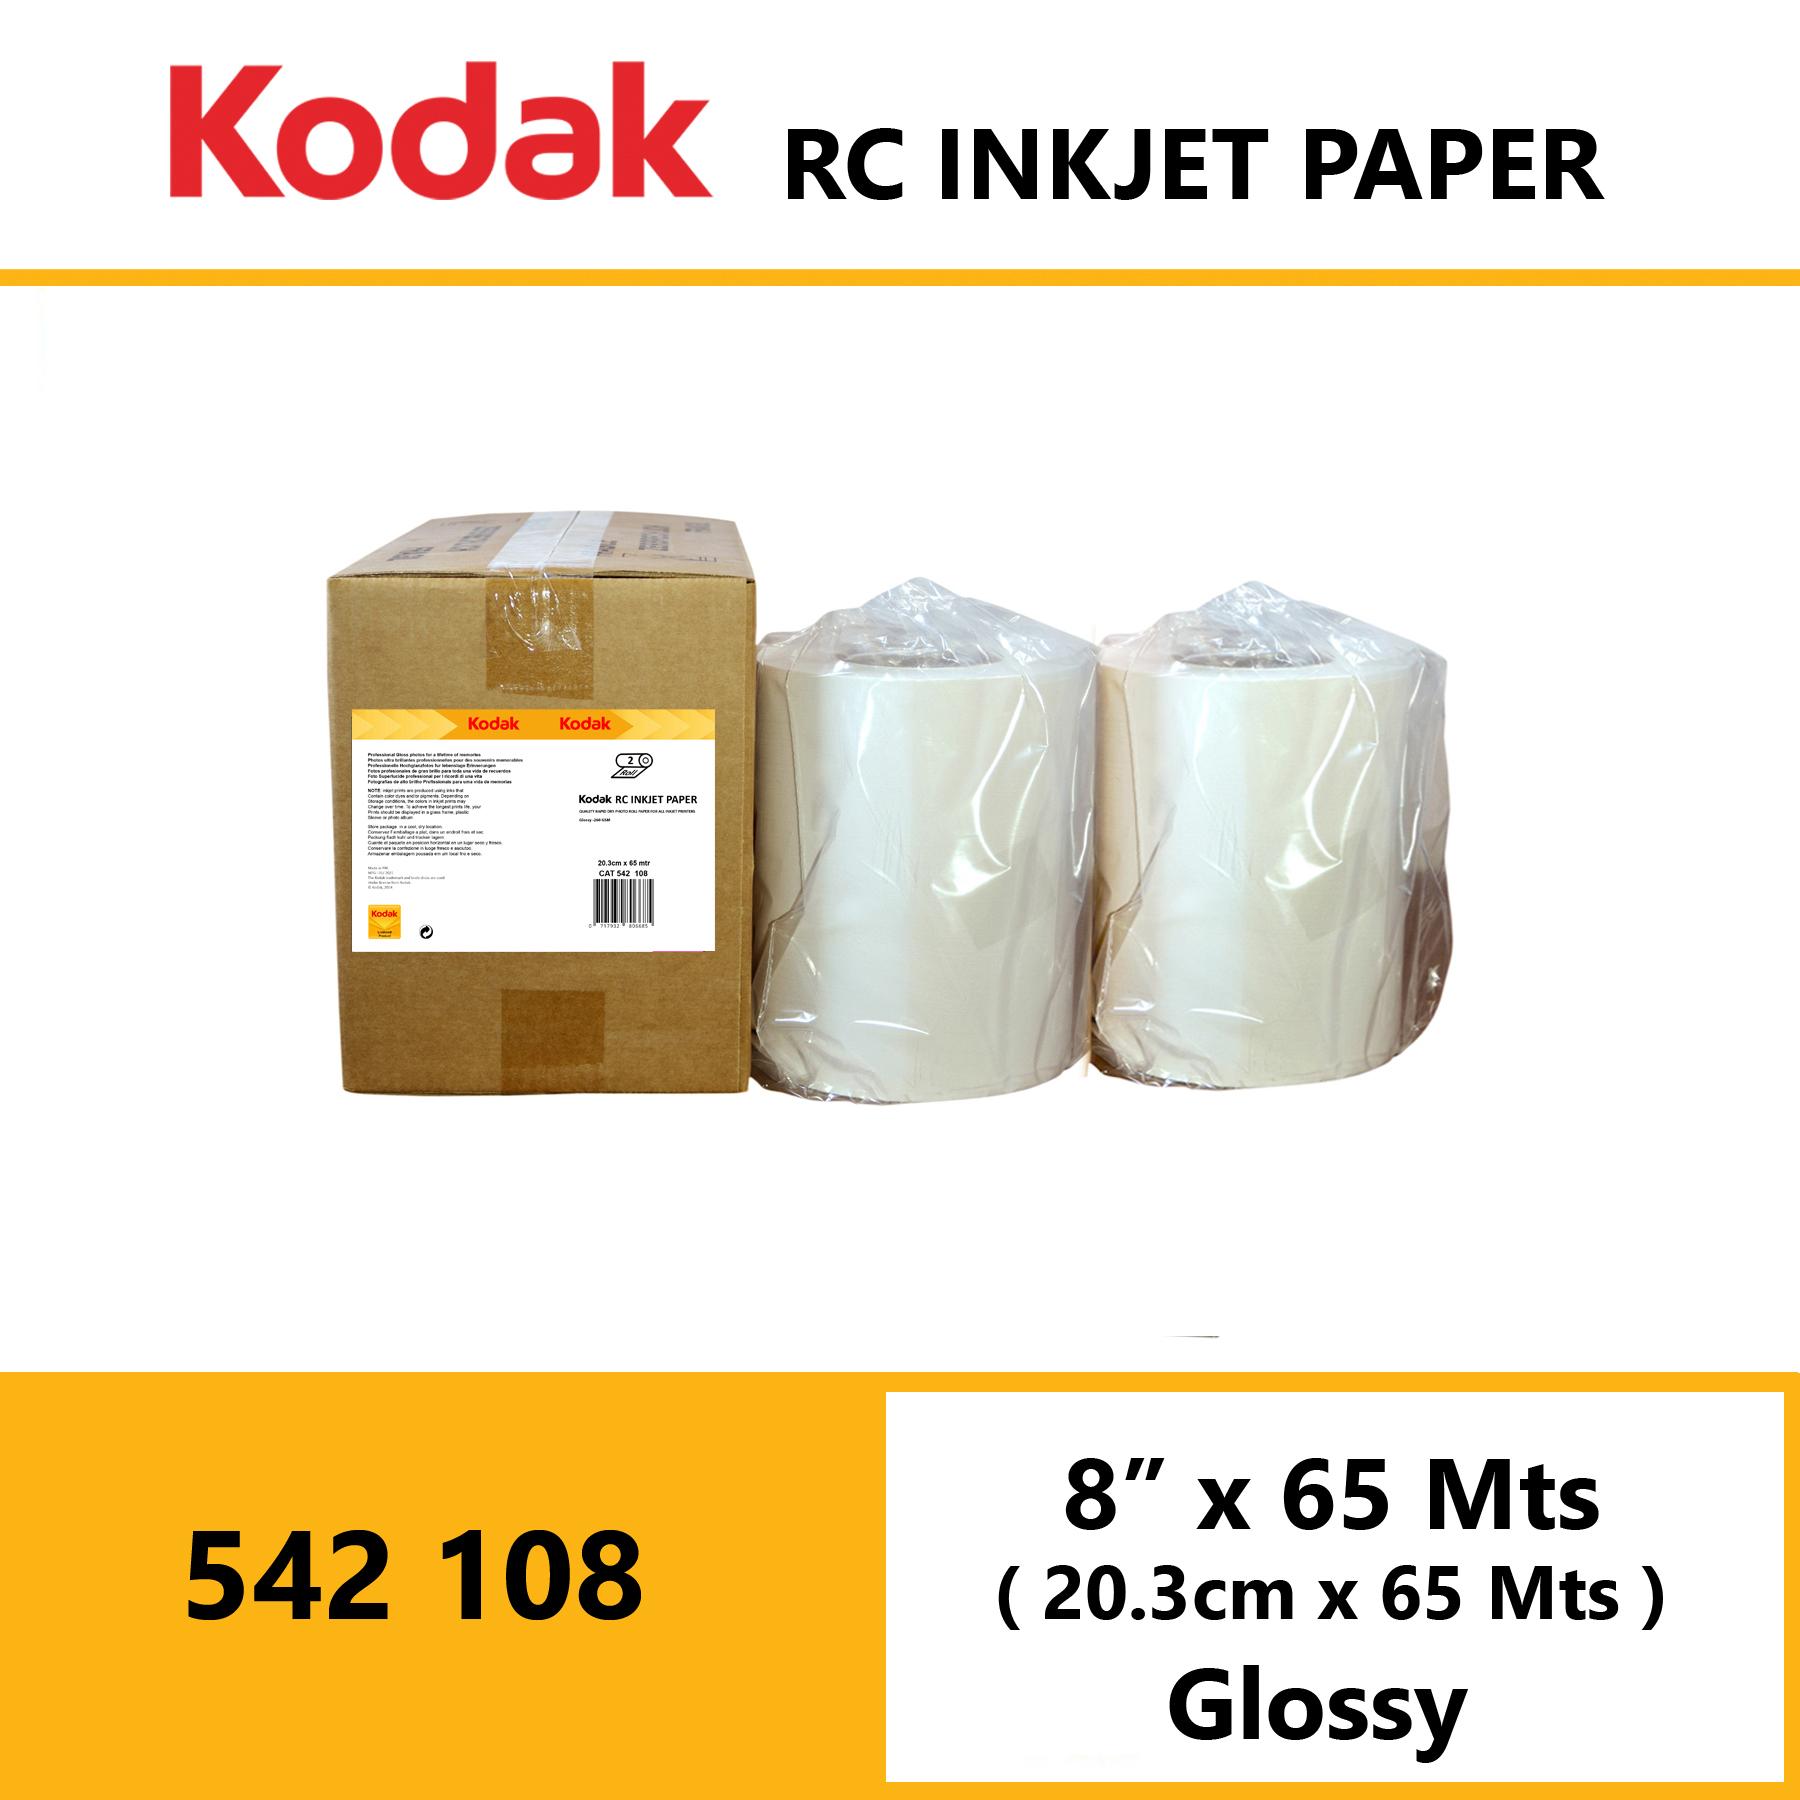 "Kodak Inkjet RC Paper 8 "" x 65 Mtrs Glossy"